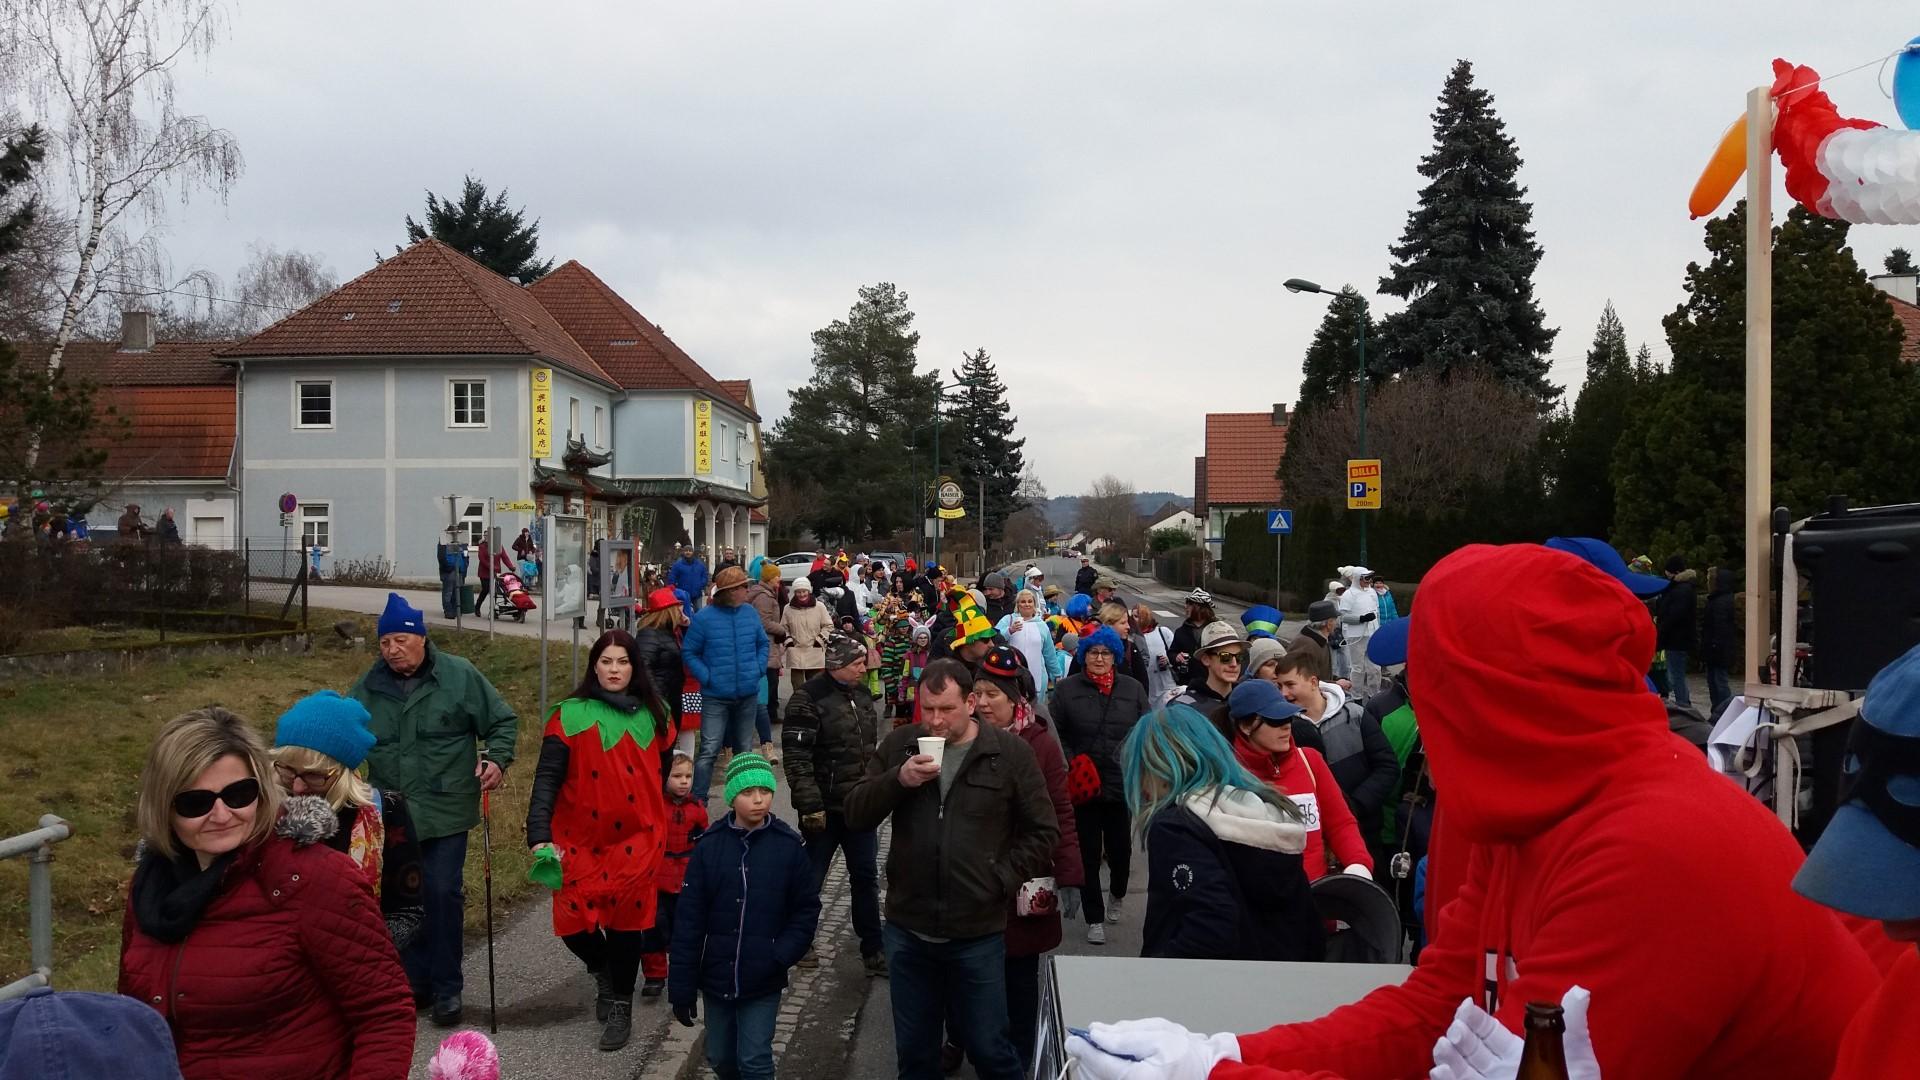 2018.02.13 Faschingsumzug Persenbeug (12) (Large)